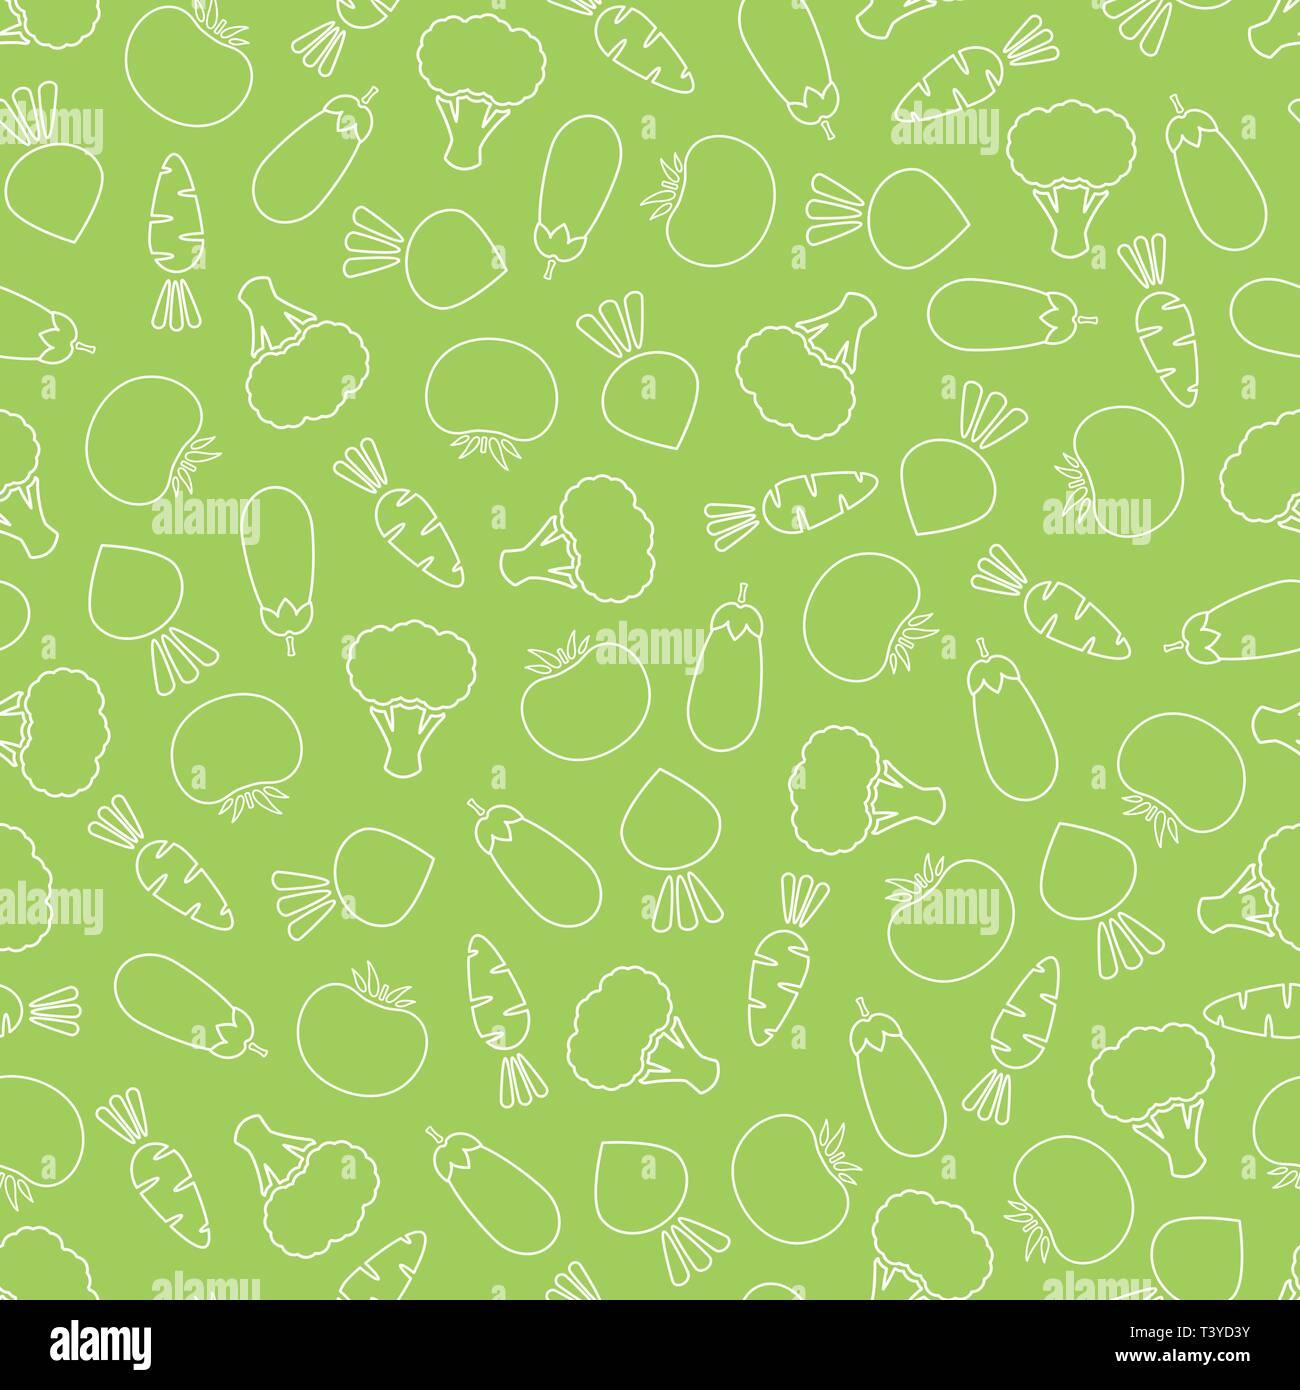 Line Vegetable Seamless Pattern Vector Flat Illustration